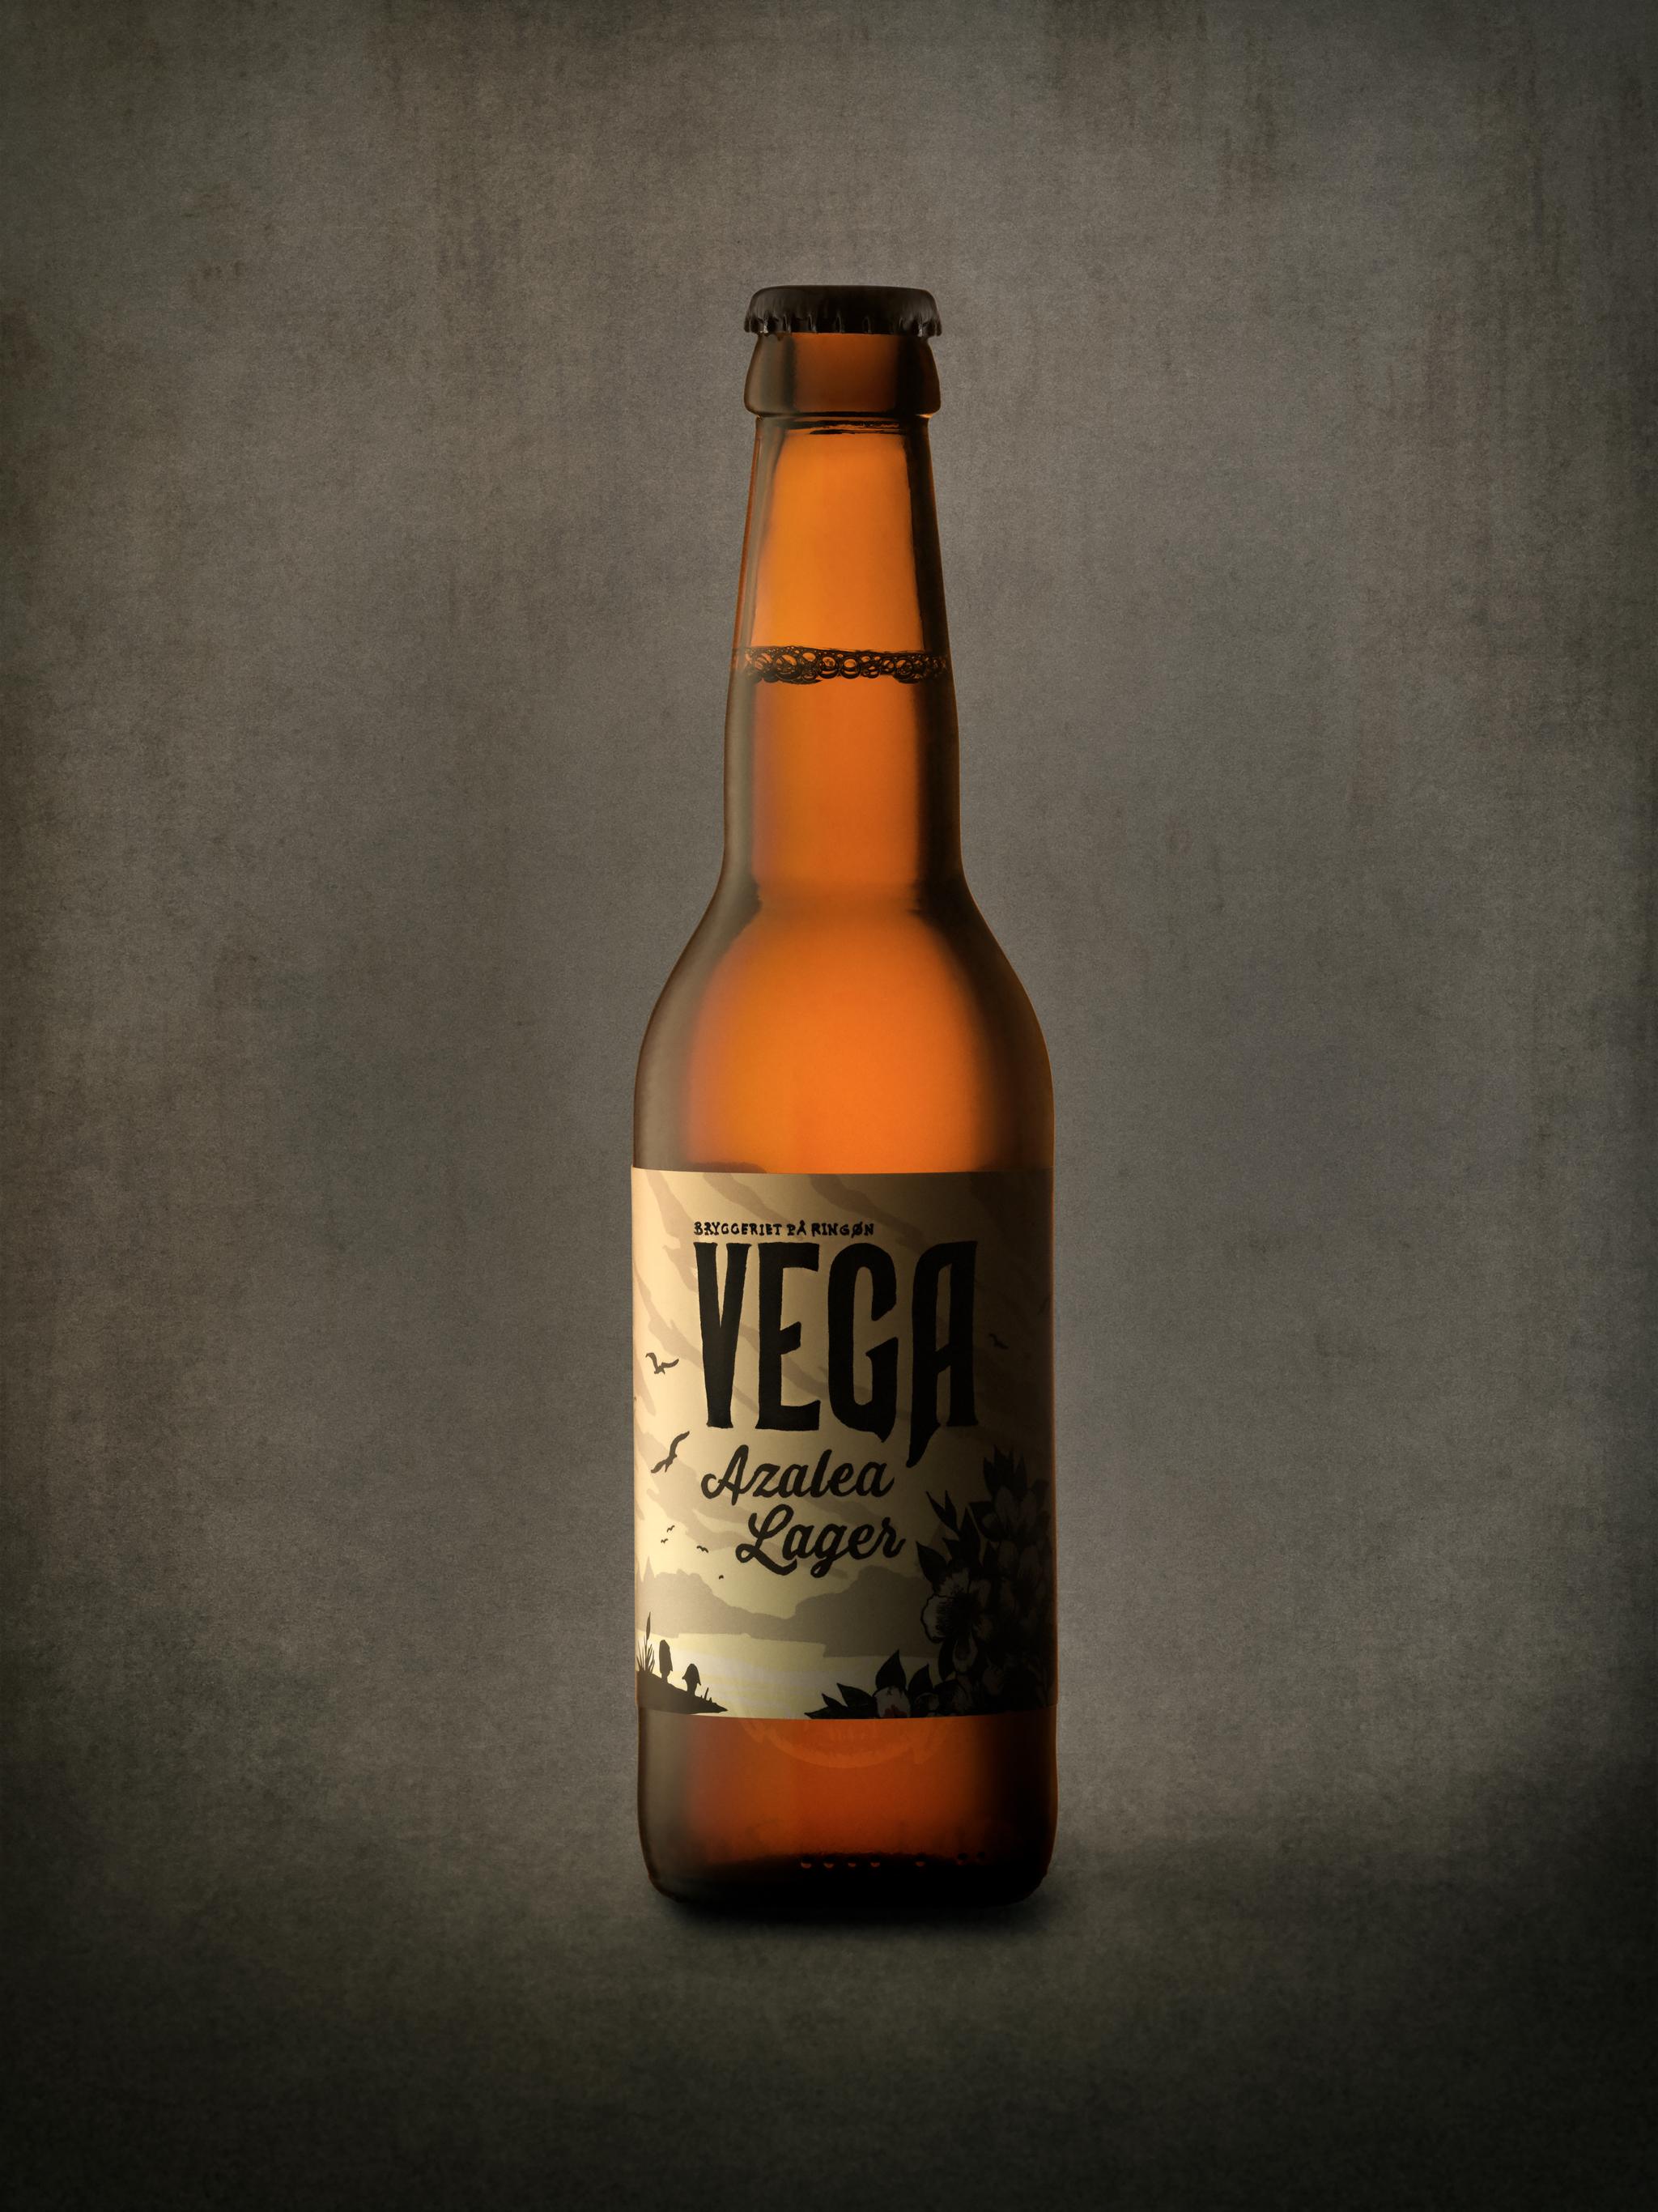 vegafoto-vega bryggeri.jpg